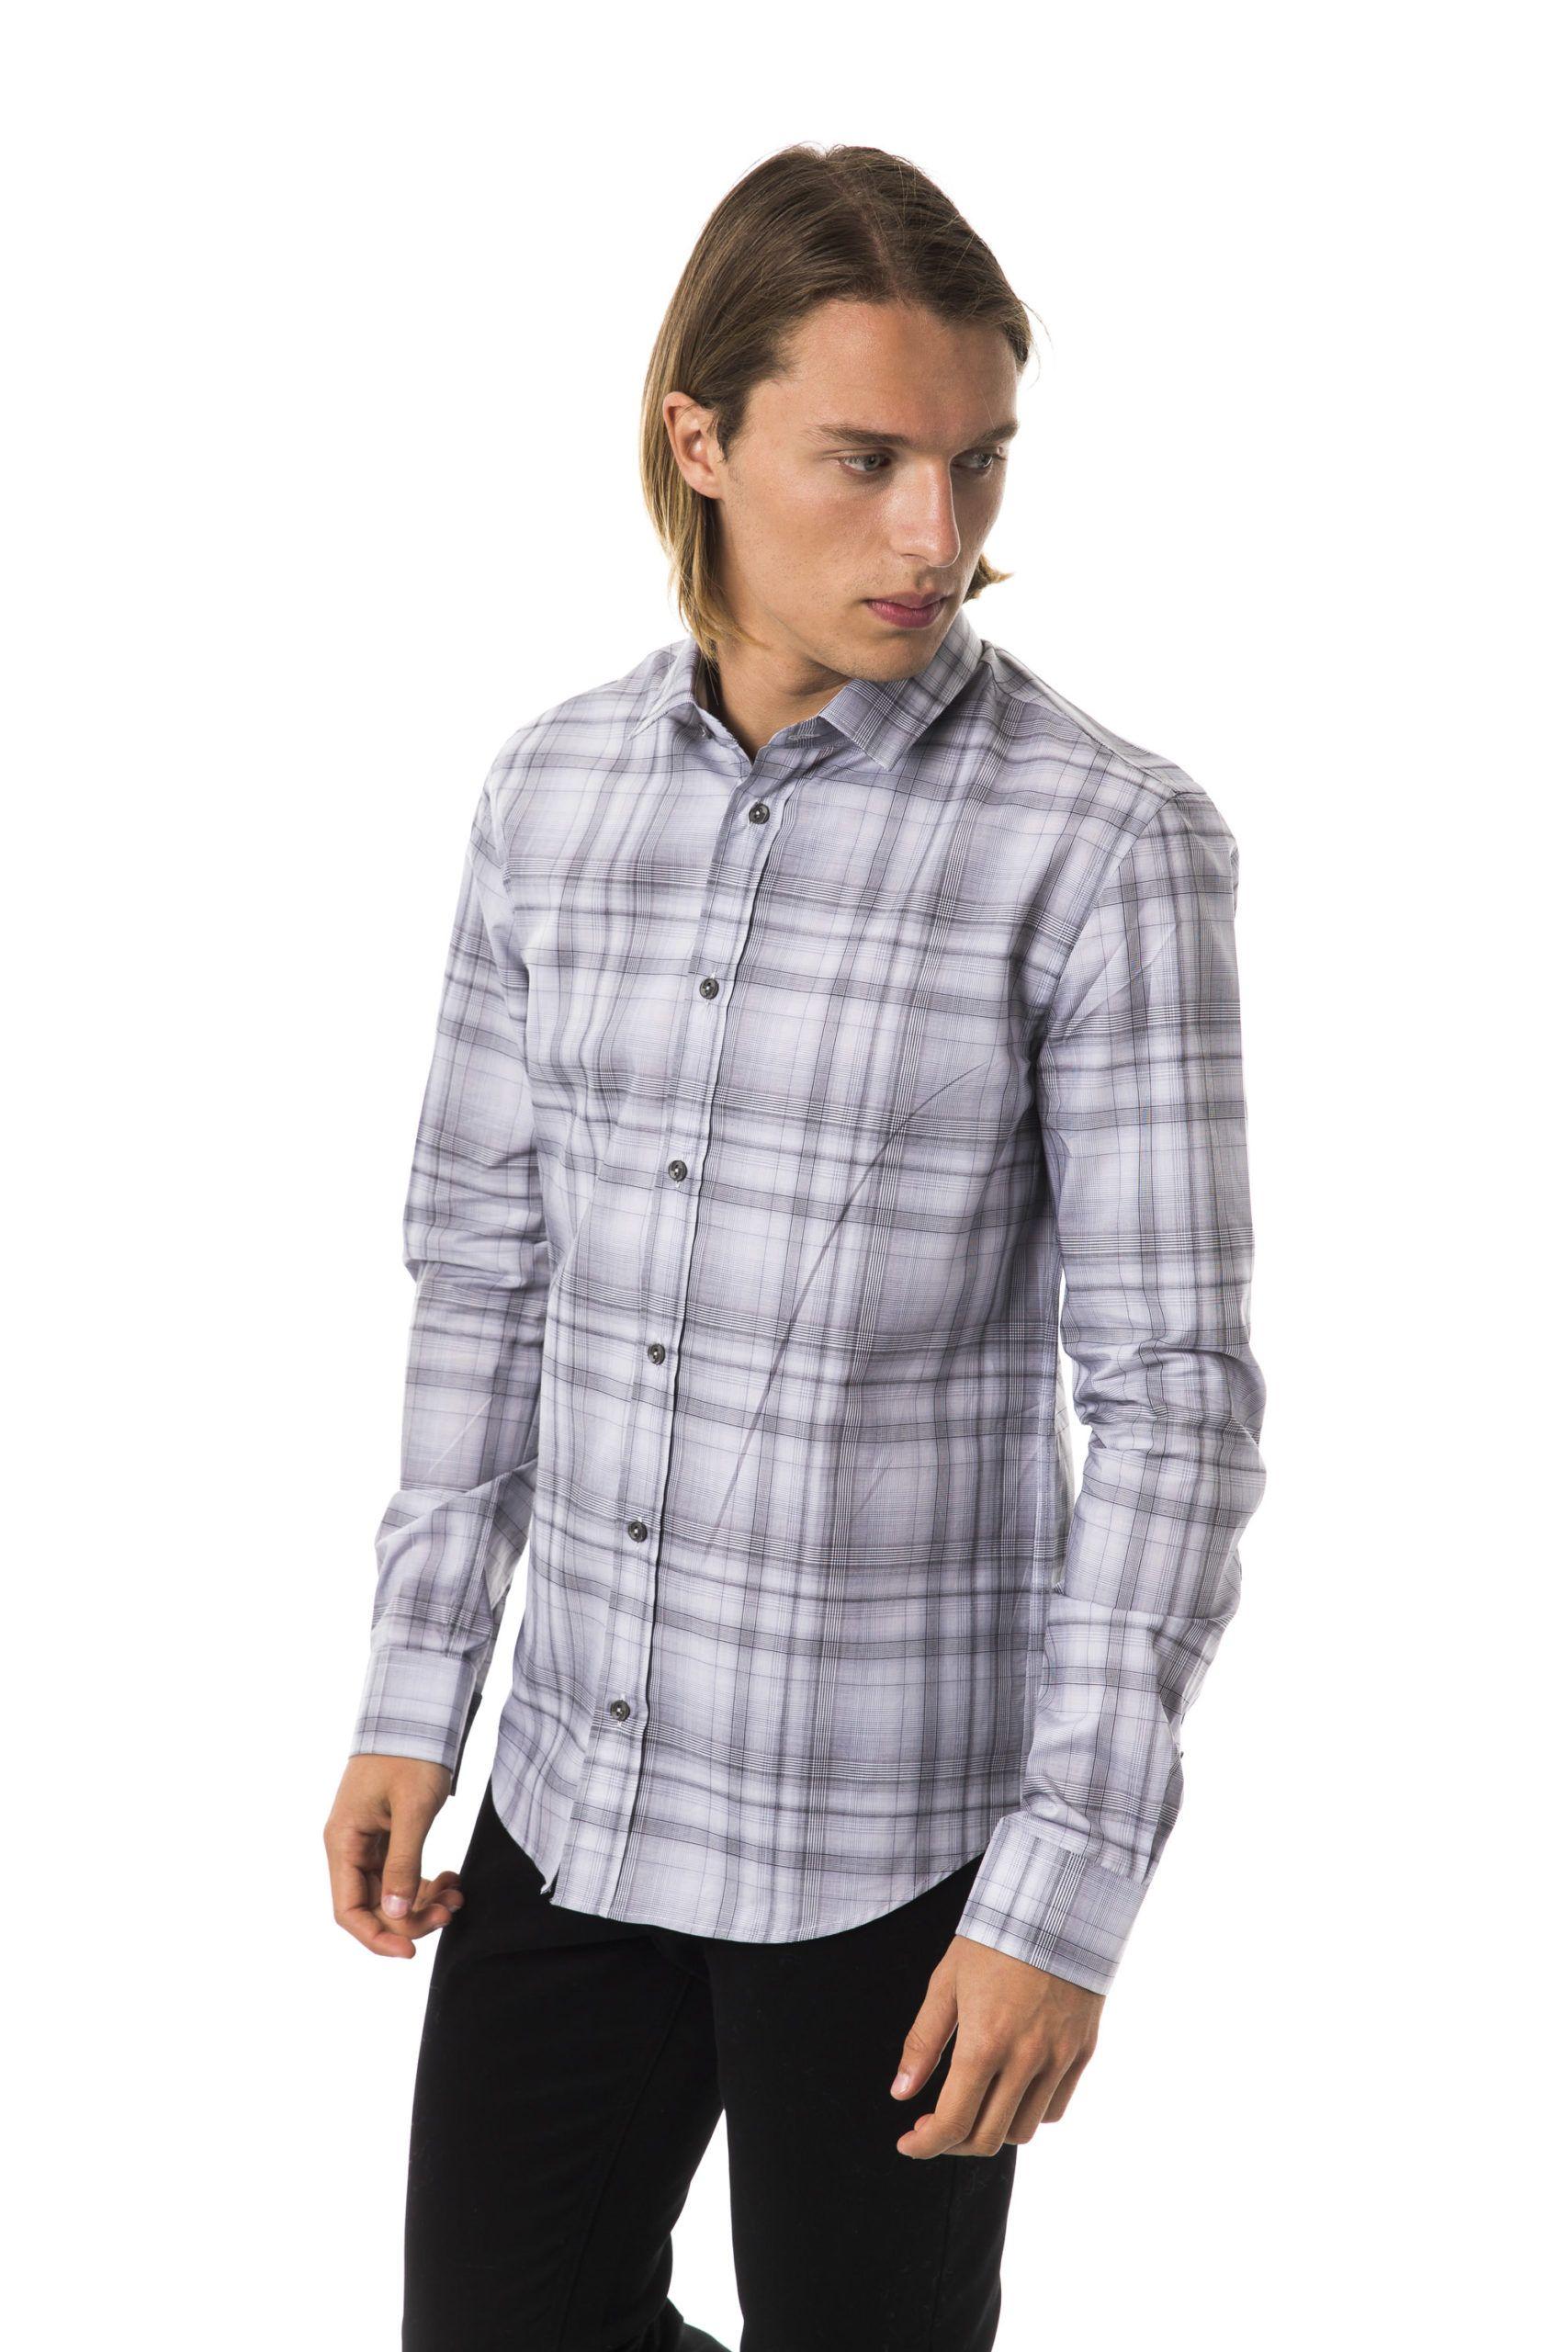 BYBLOS Grigionaturale Shirt